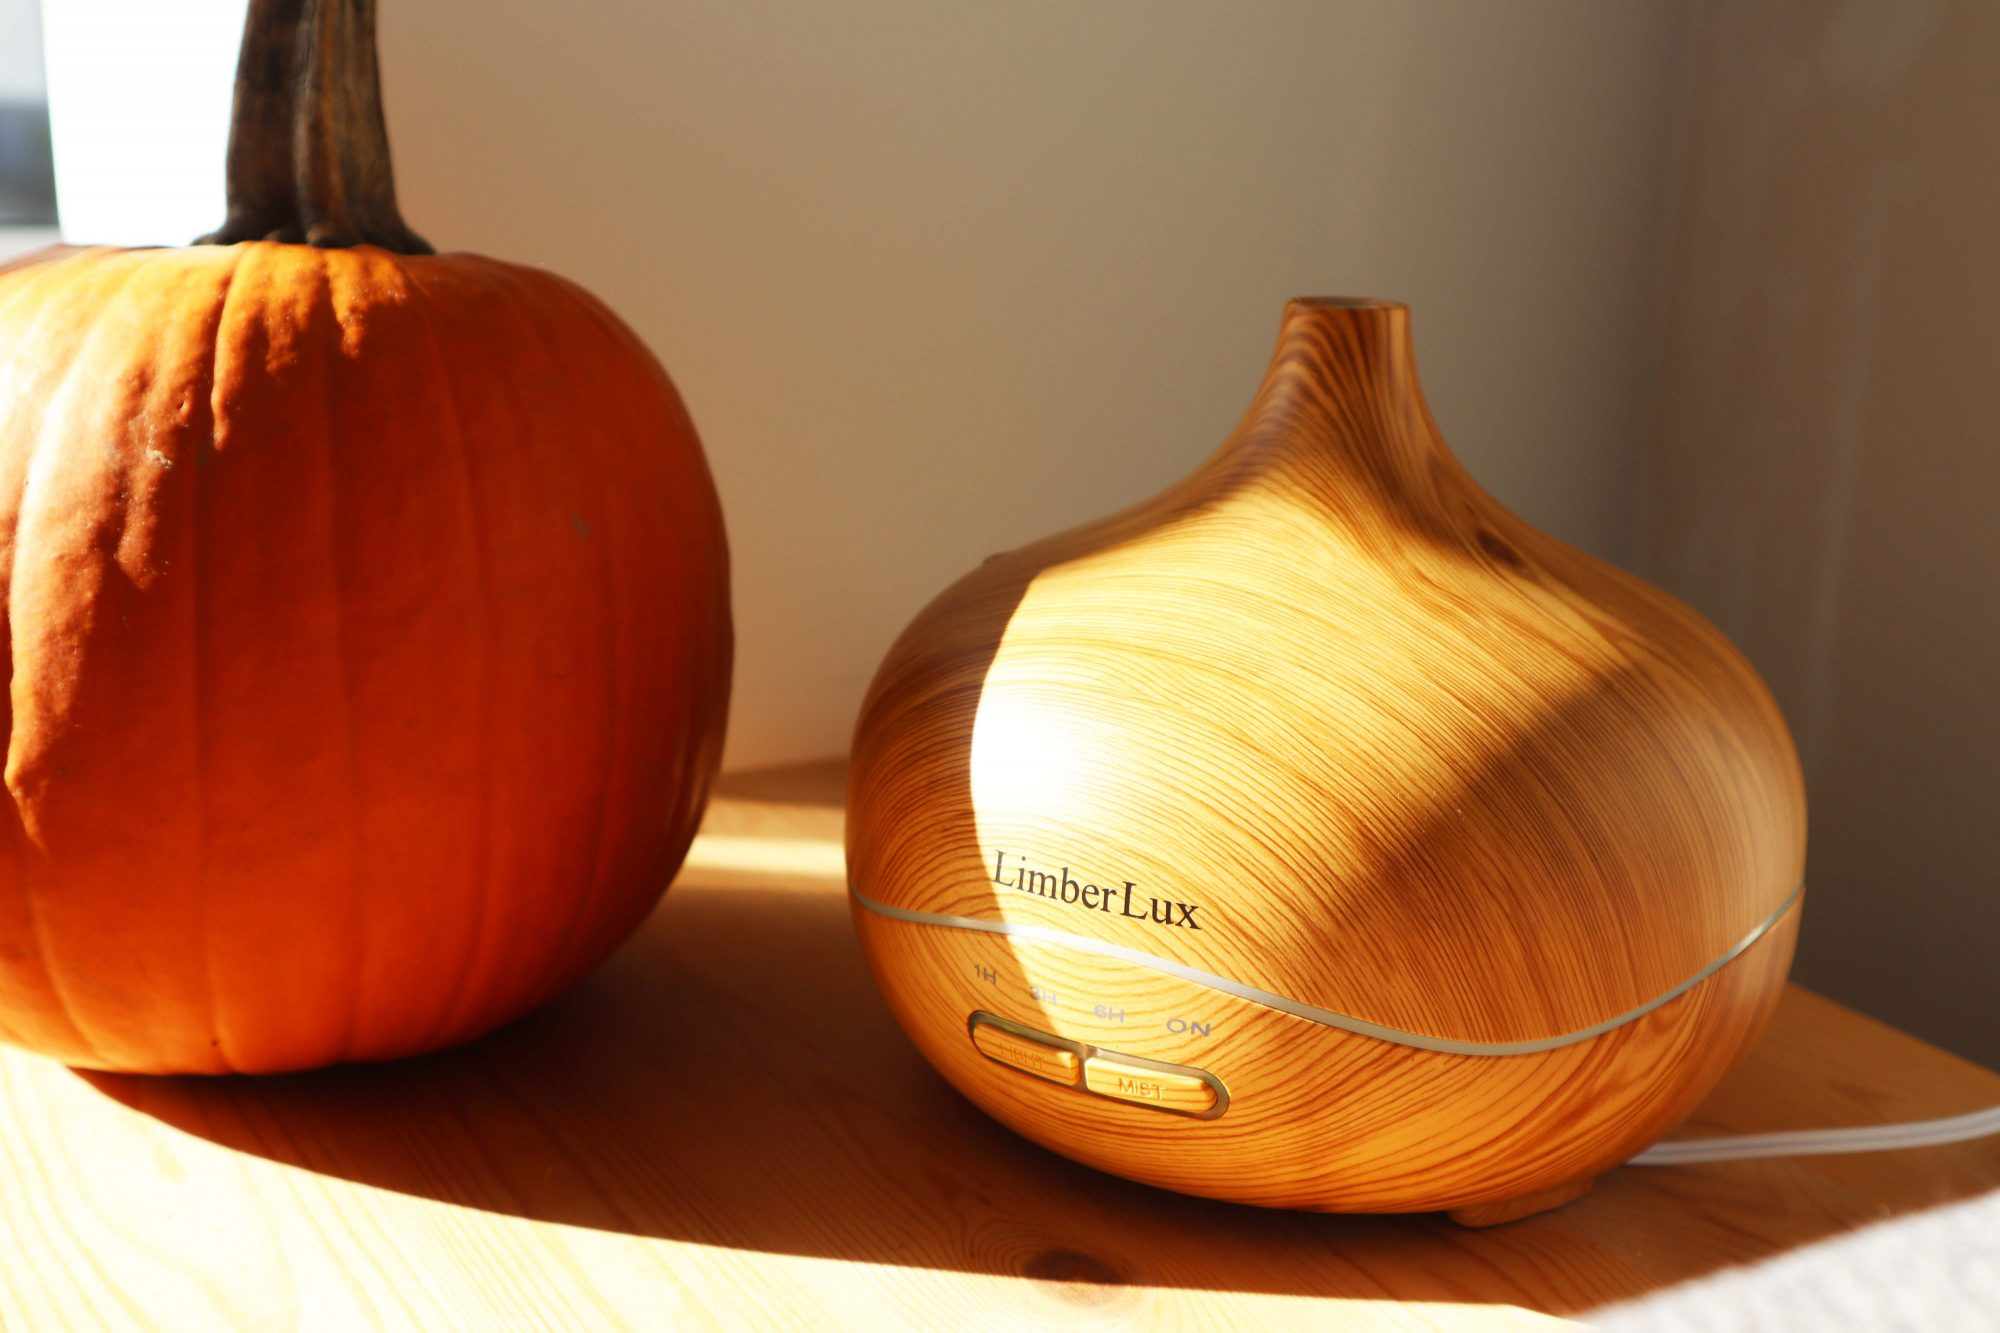 LimberLux Aroma Diffuser